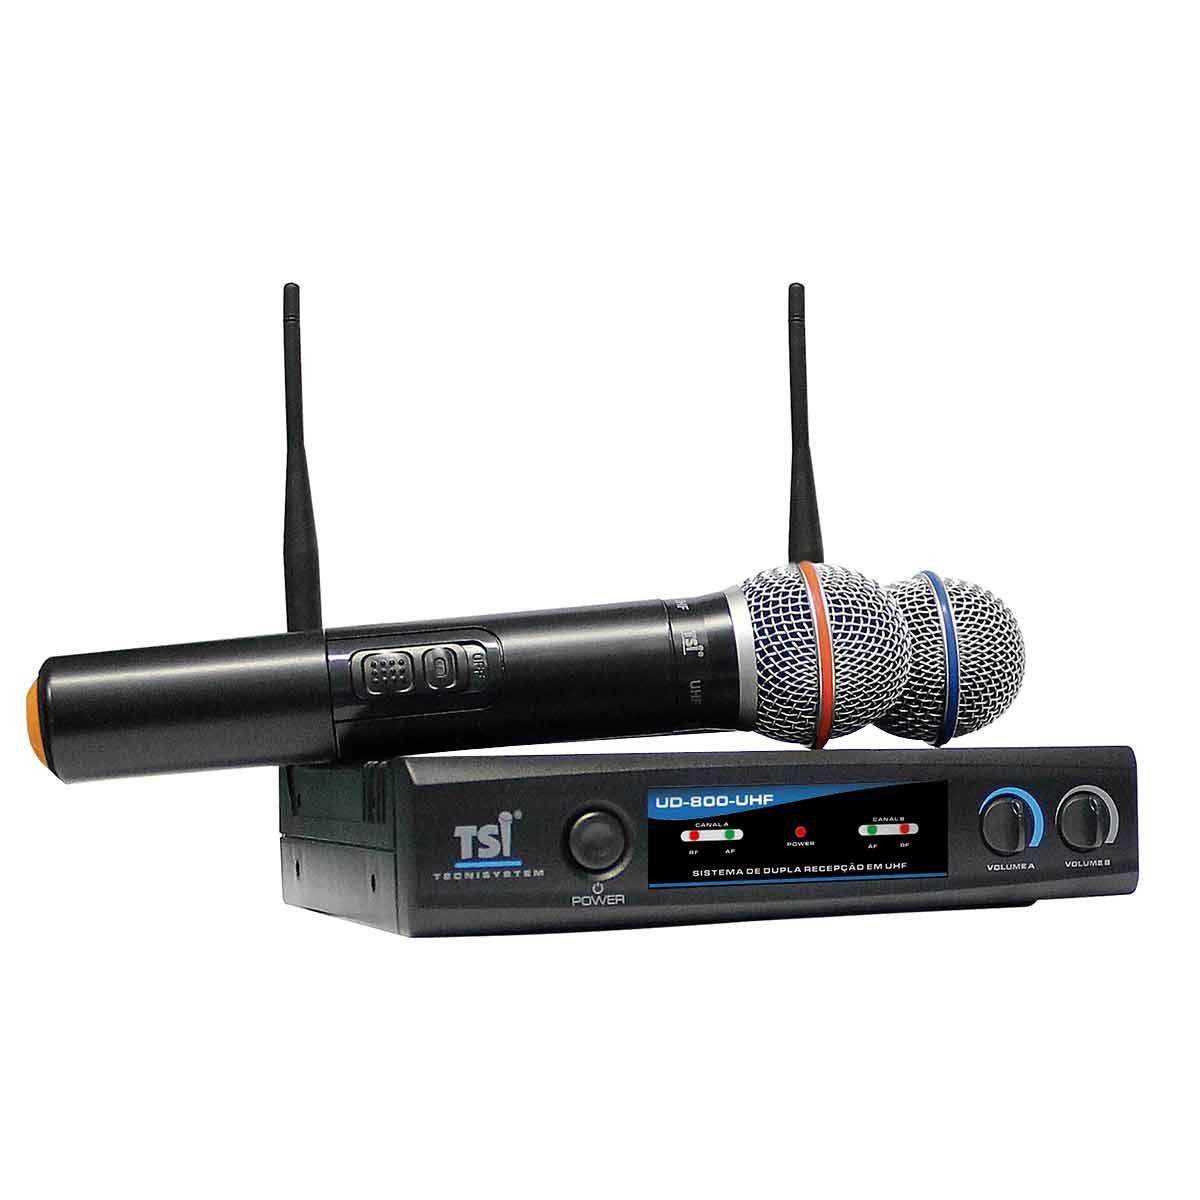 Microfone s/ Fio de M�o Duplo UHF UD-800-UHF - TSI